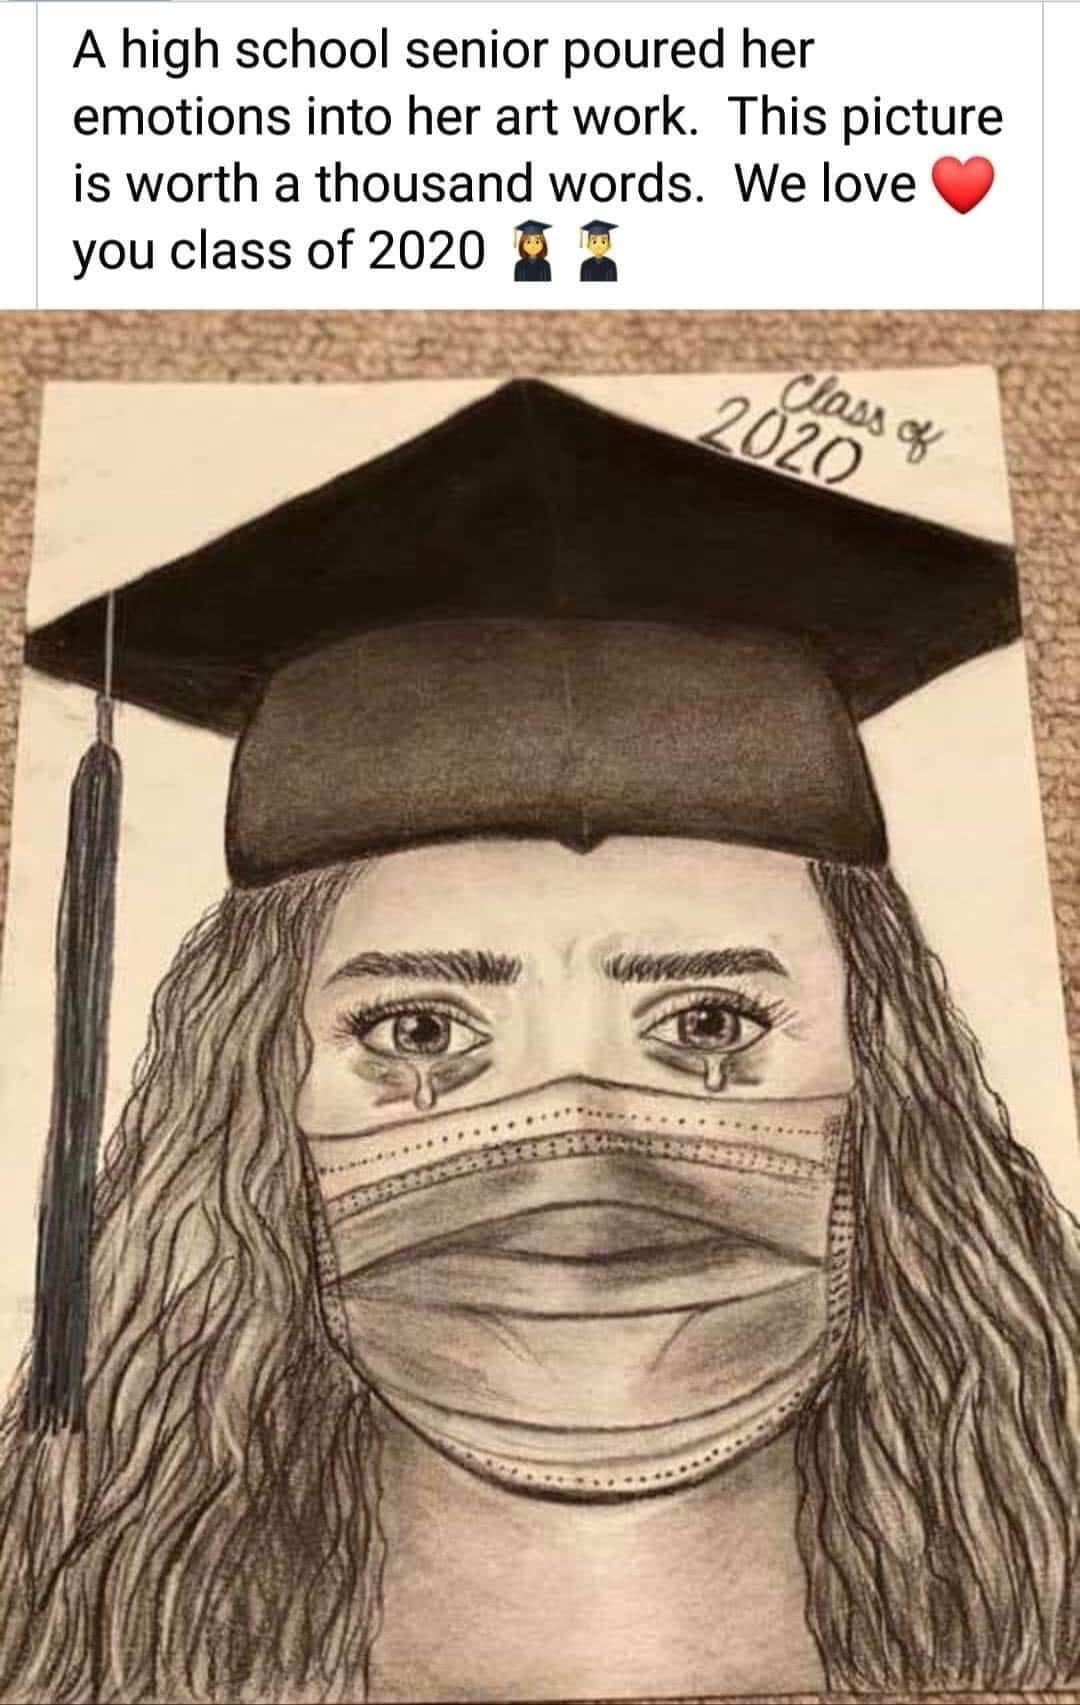 It's okay to grieve - graduate 2020